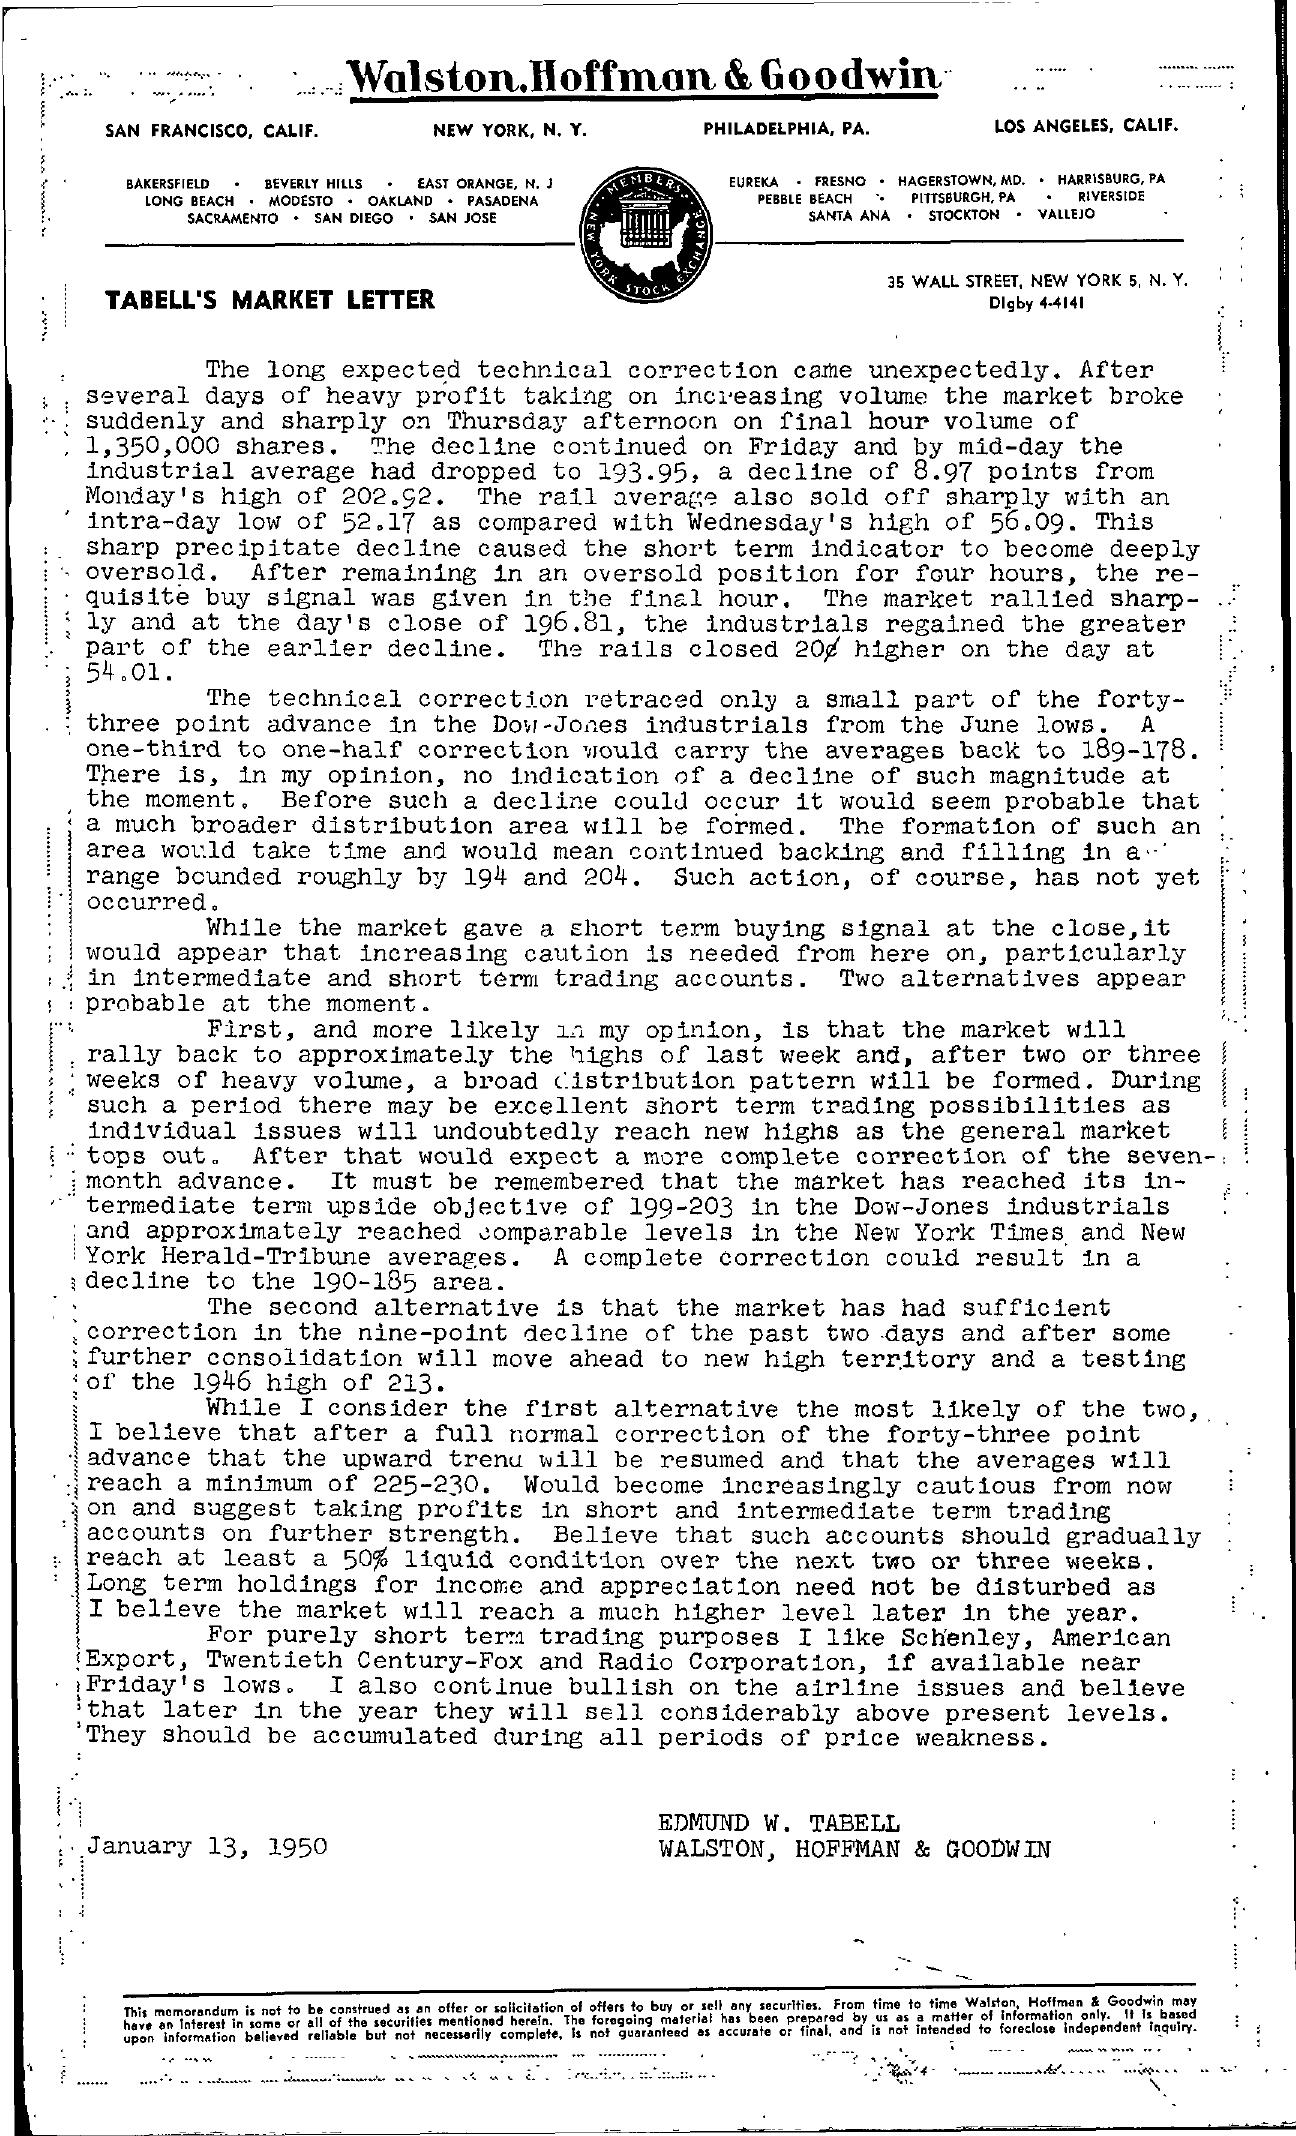 Tabell's Market Letter - January 13, 1950